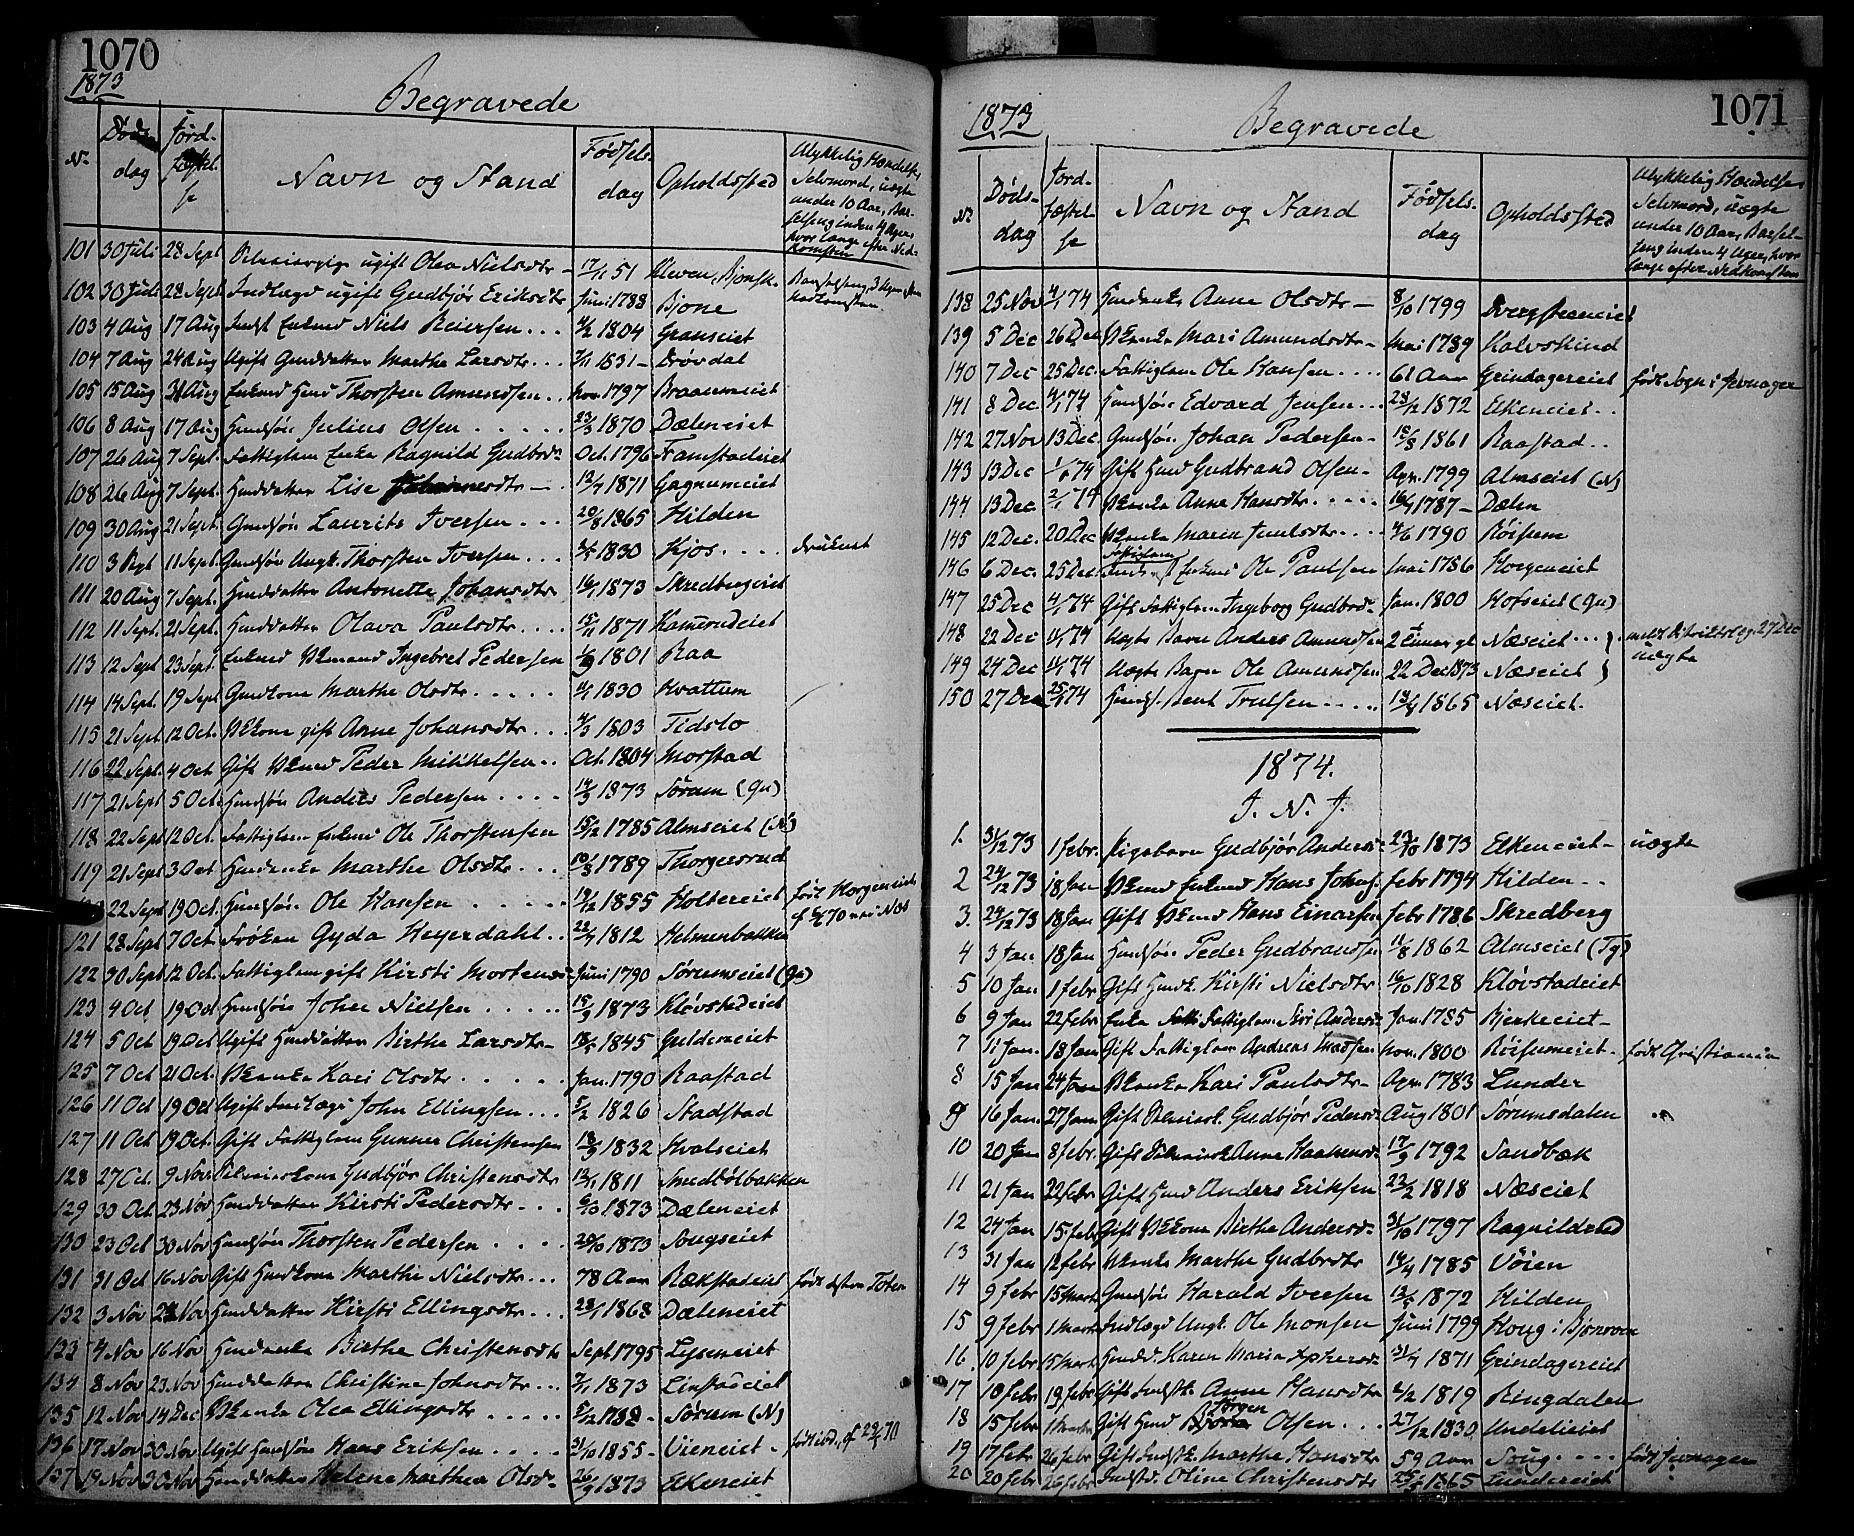 SAH, Gran prestekontor, Ministerialbok nr. 12, 1856-1874, s. 1070-1071